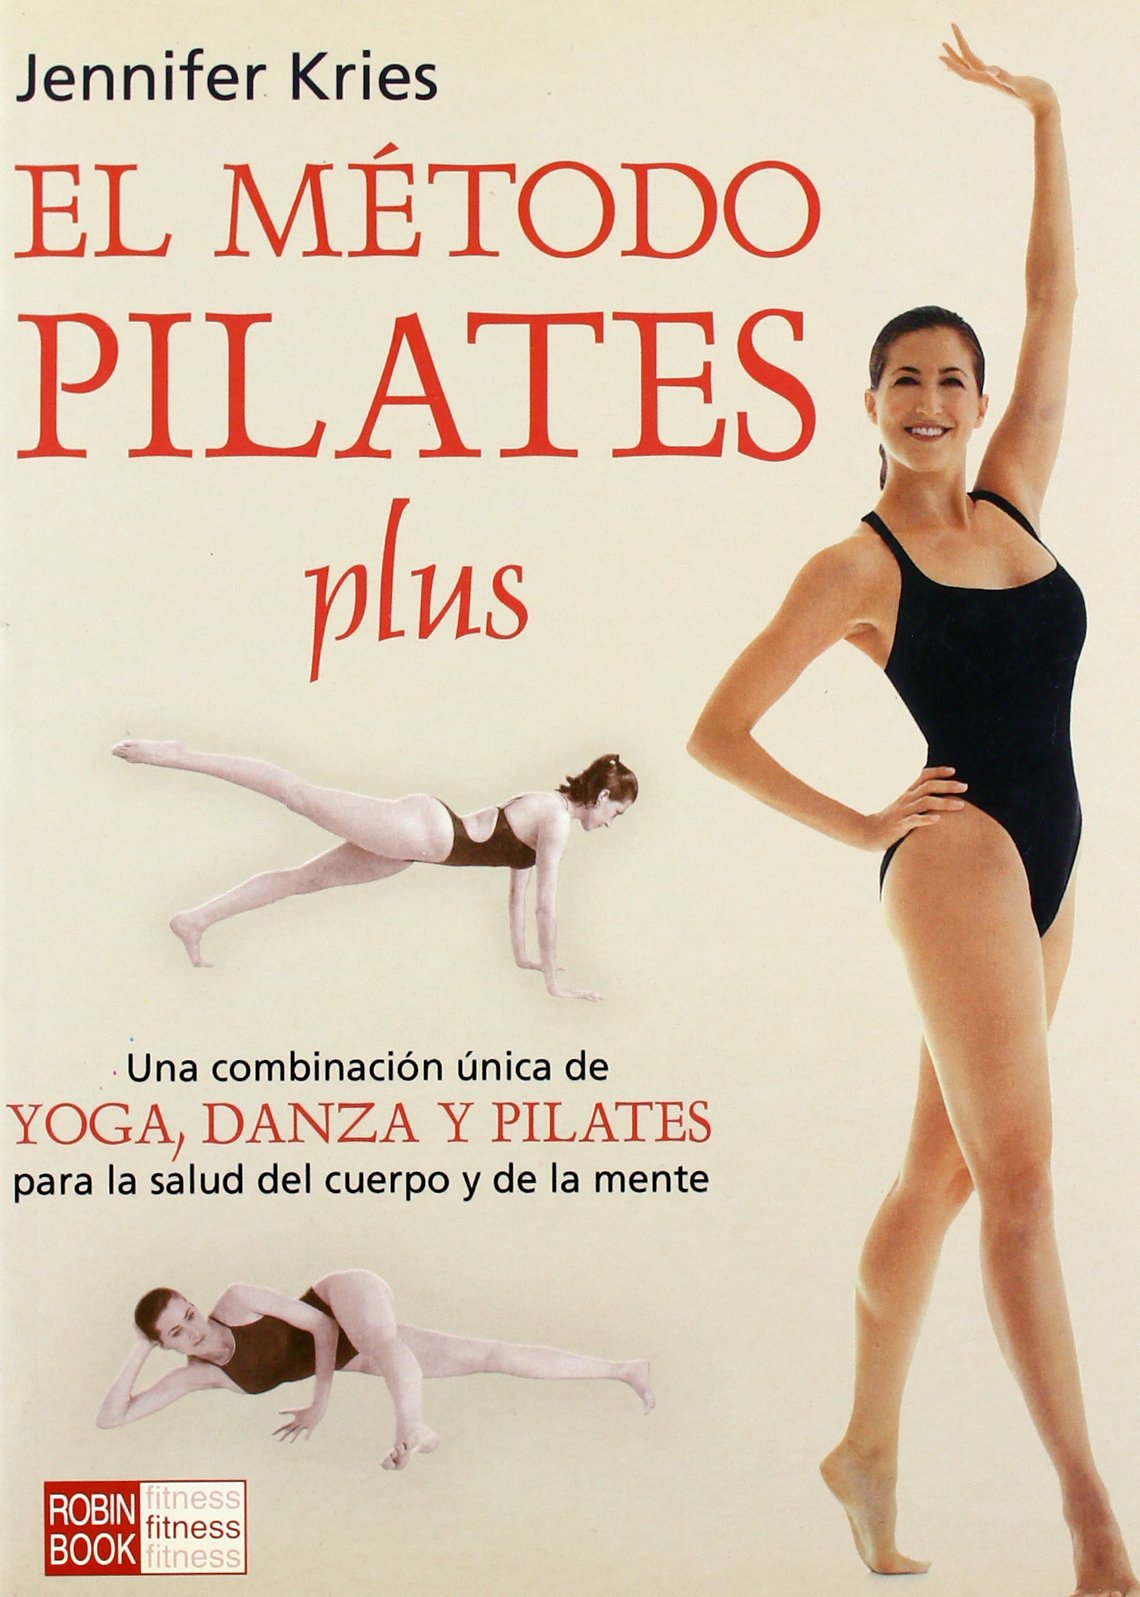 El metodo pilates plus / Jennifer Kries Pilates Plus Method ...